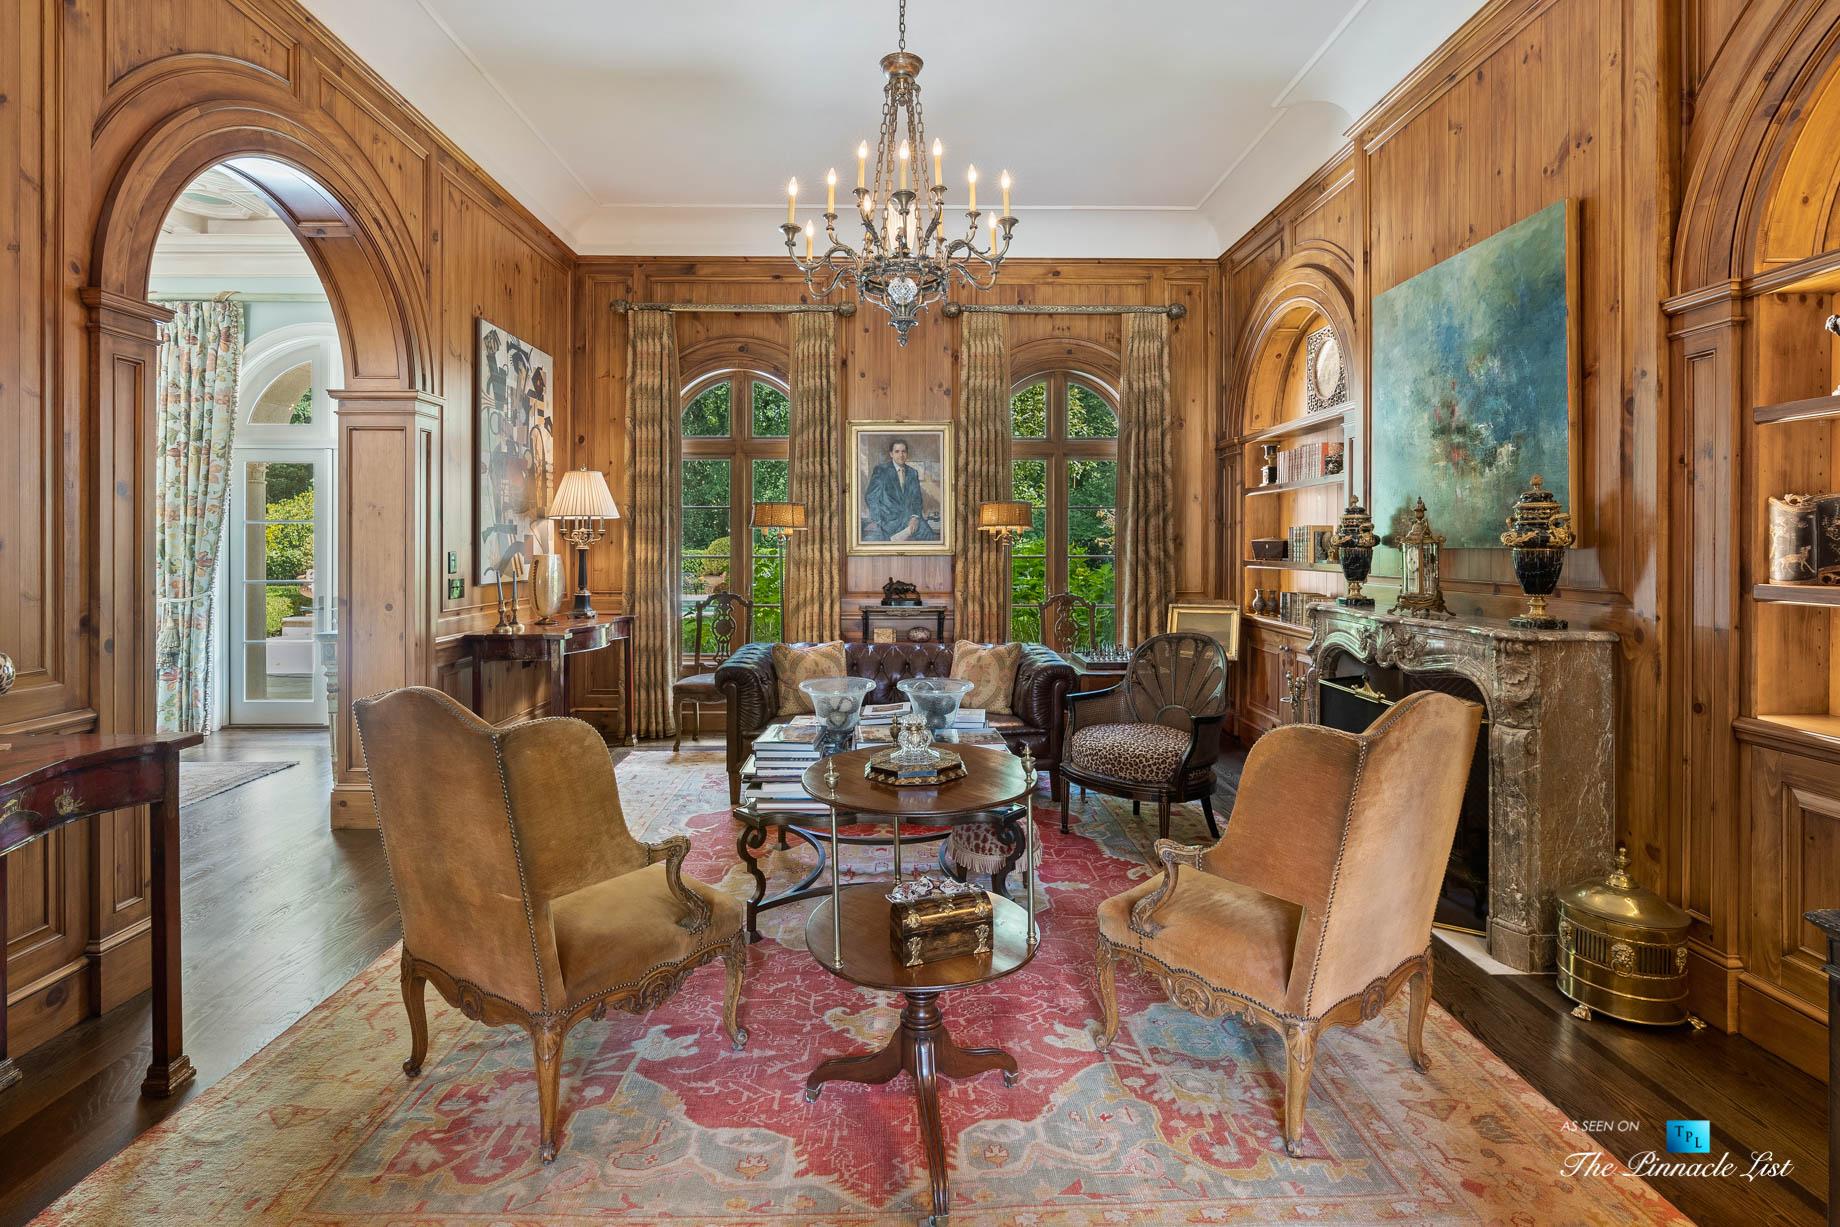 439 Blackland Rd NW, Atlanta, GA, USA - Formal Sitting Room - Luxury Real Estate - Tuxedo Park Mediterranean Mansion Home